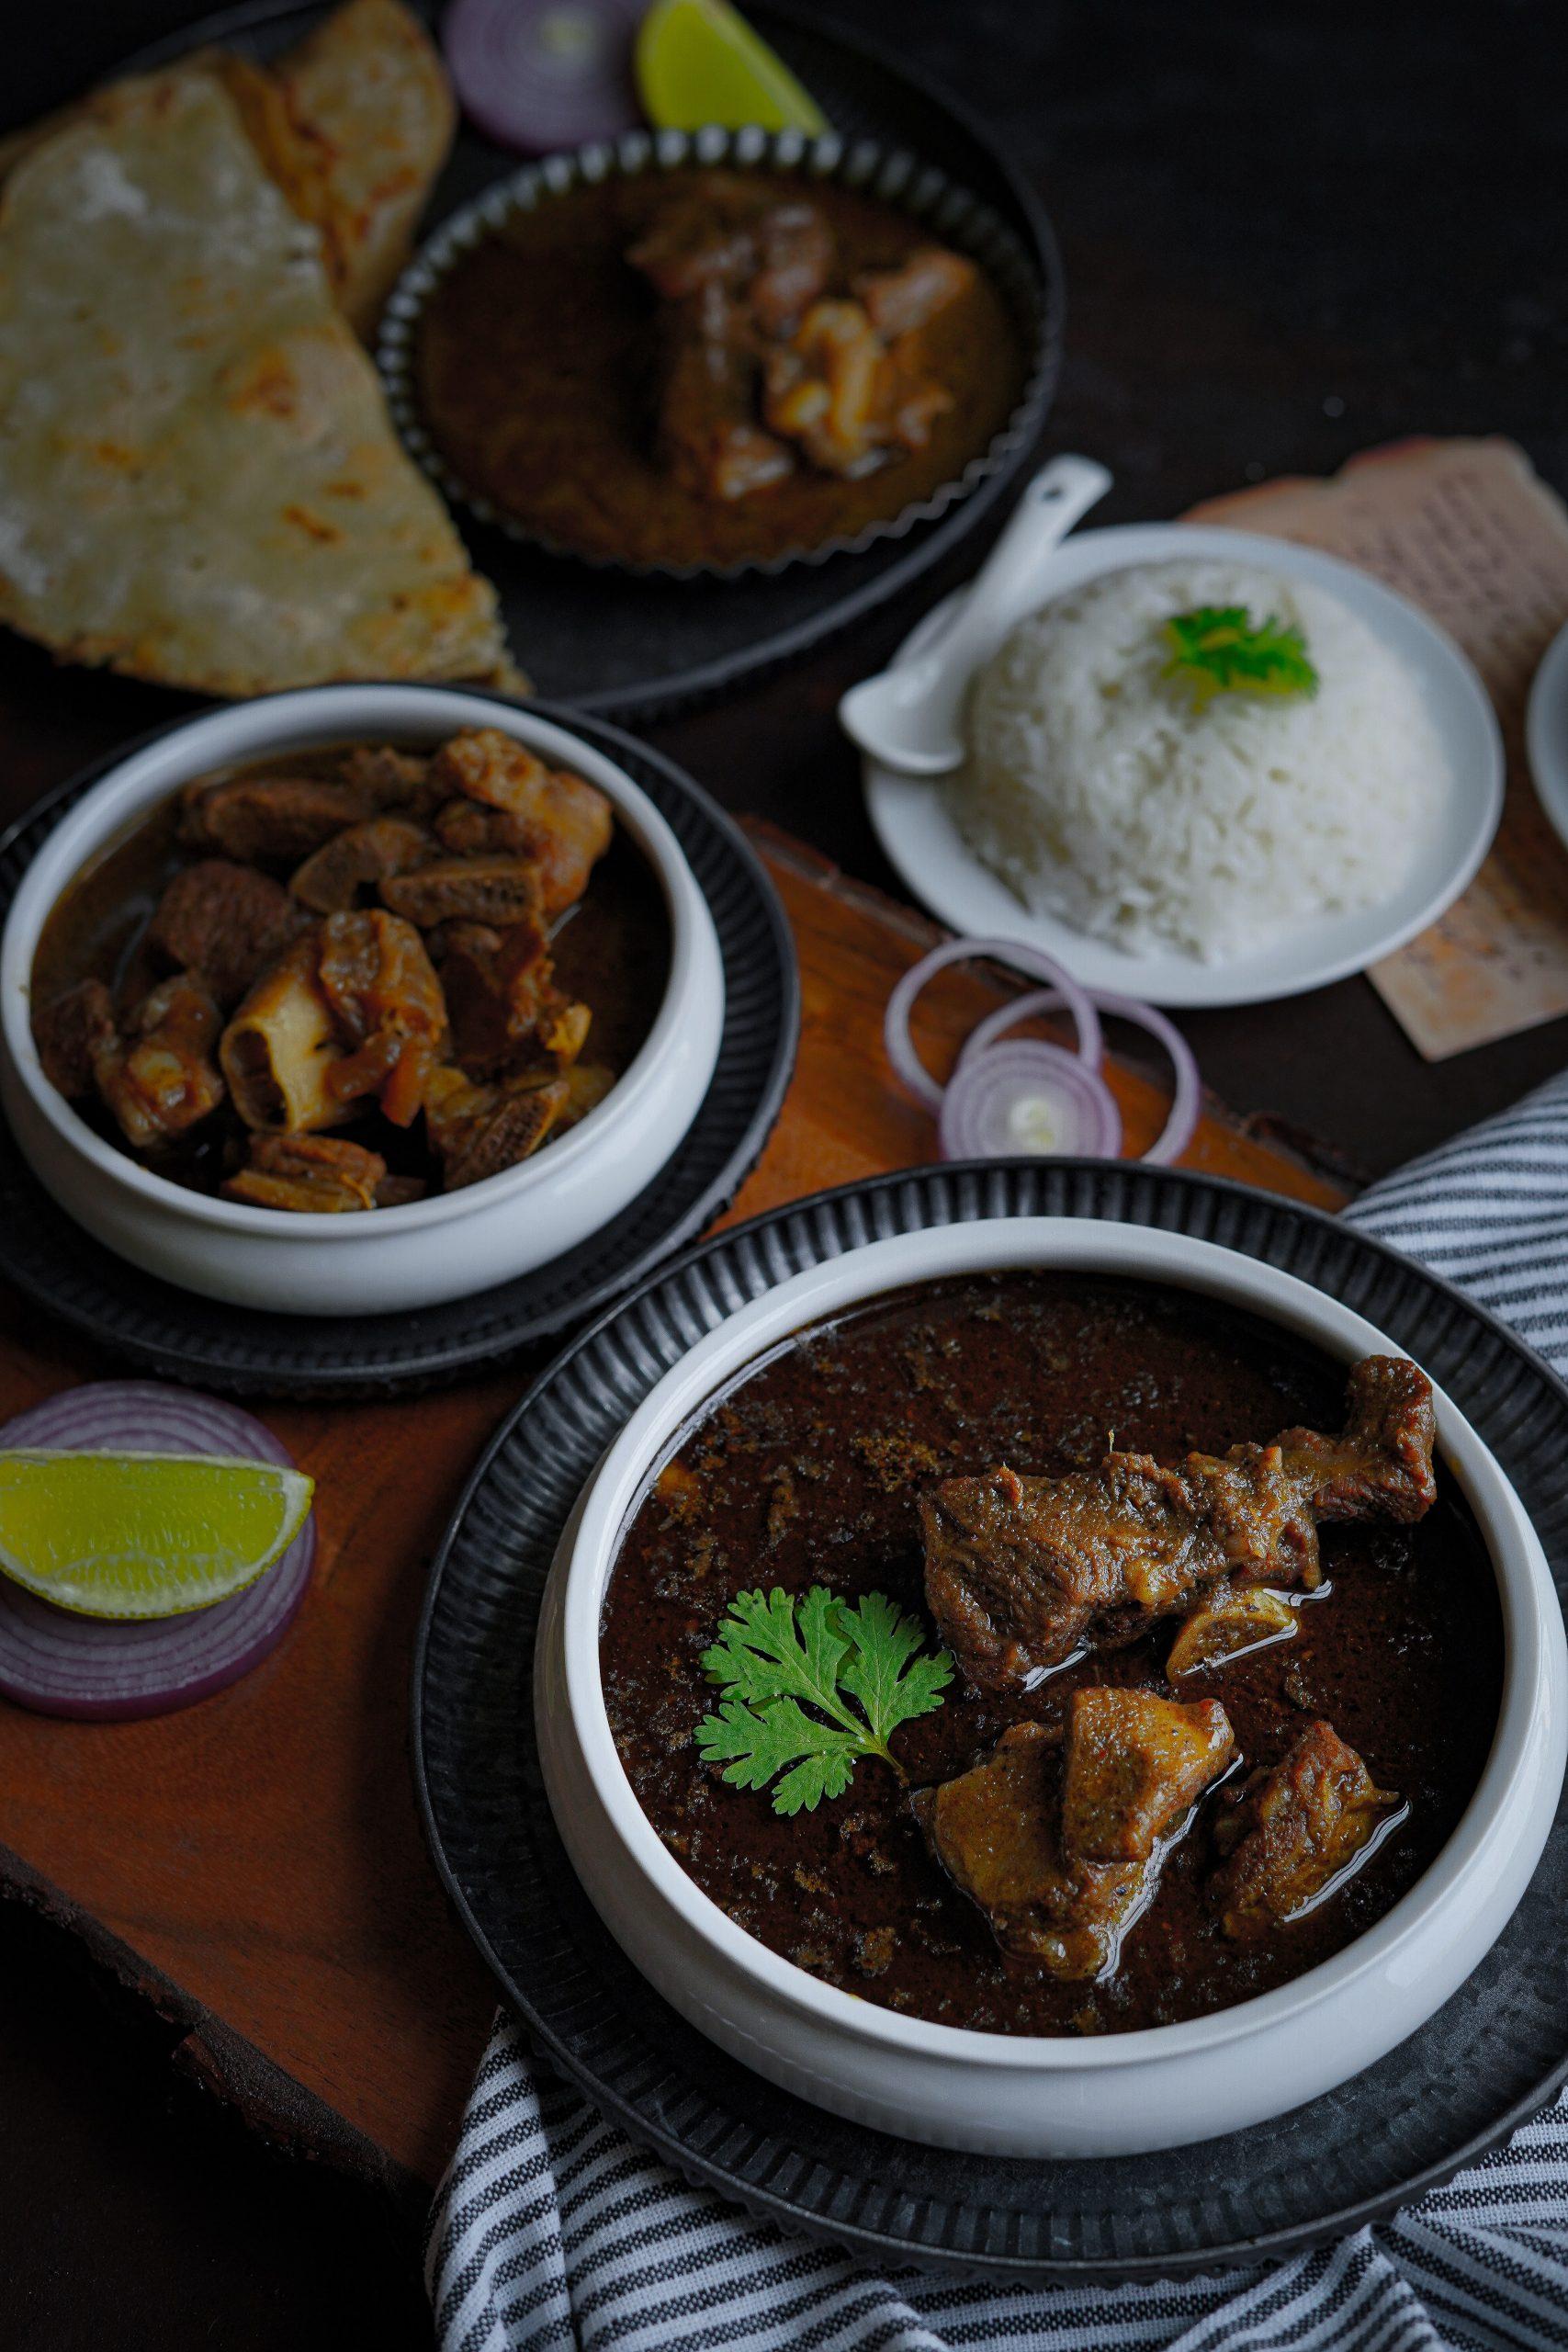 food in Jamaica, jamaican food, jamaican cuisine, jamaican dishes, jamaican drinks, jamaican appetizers, jamaican traditional food, Curry goat